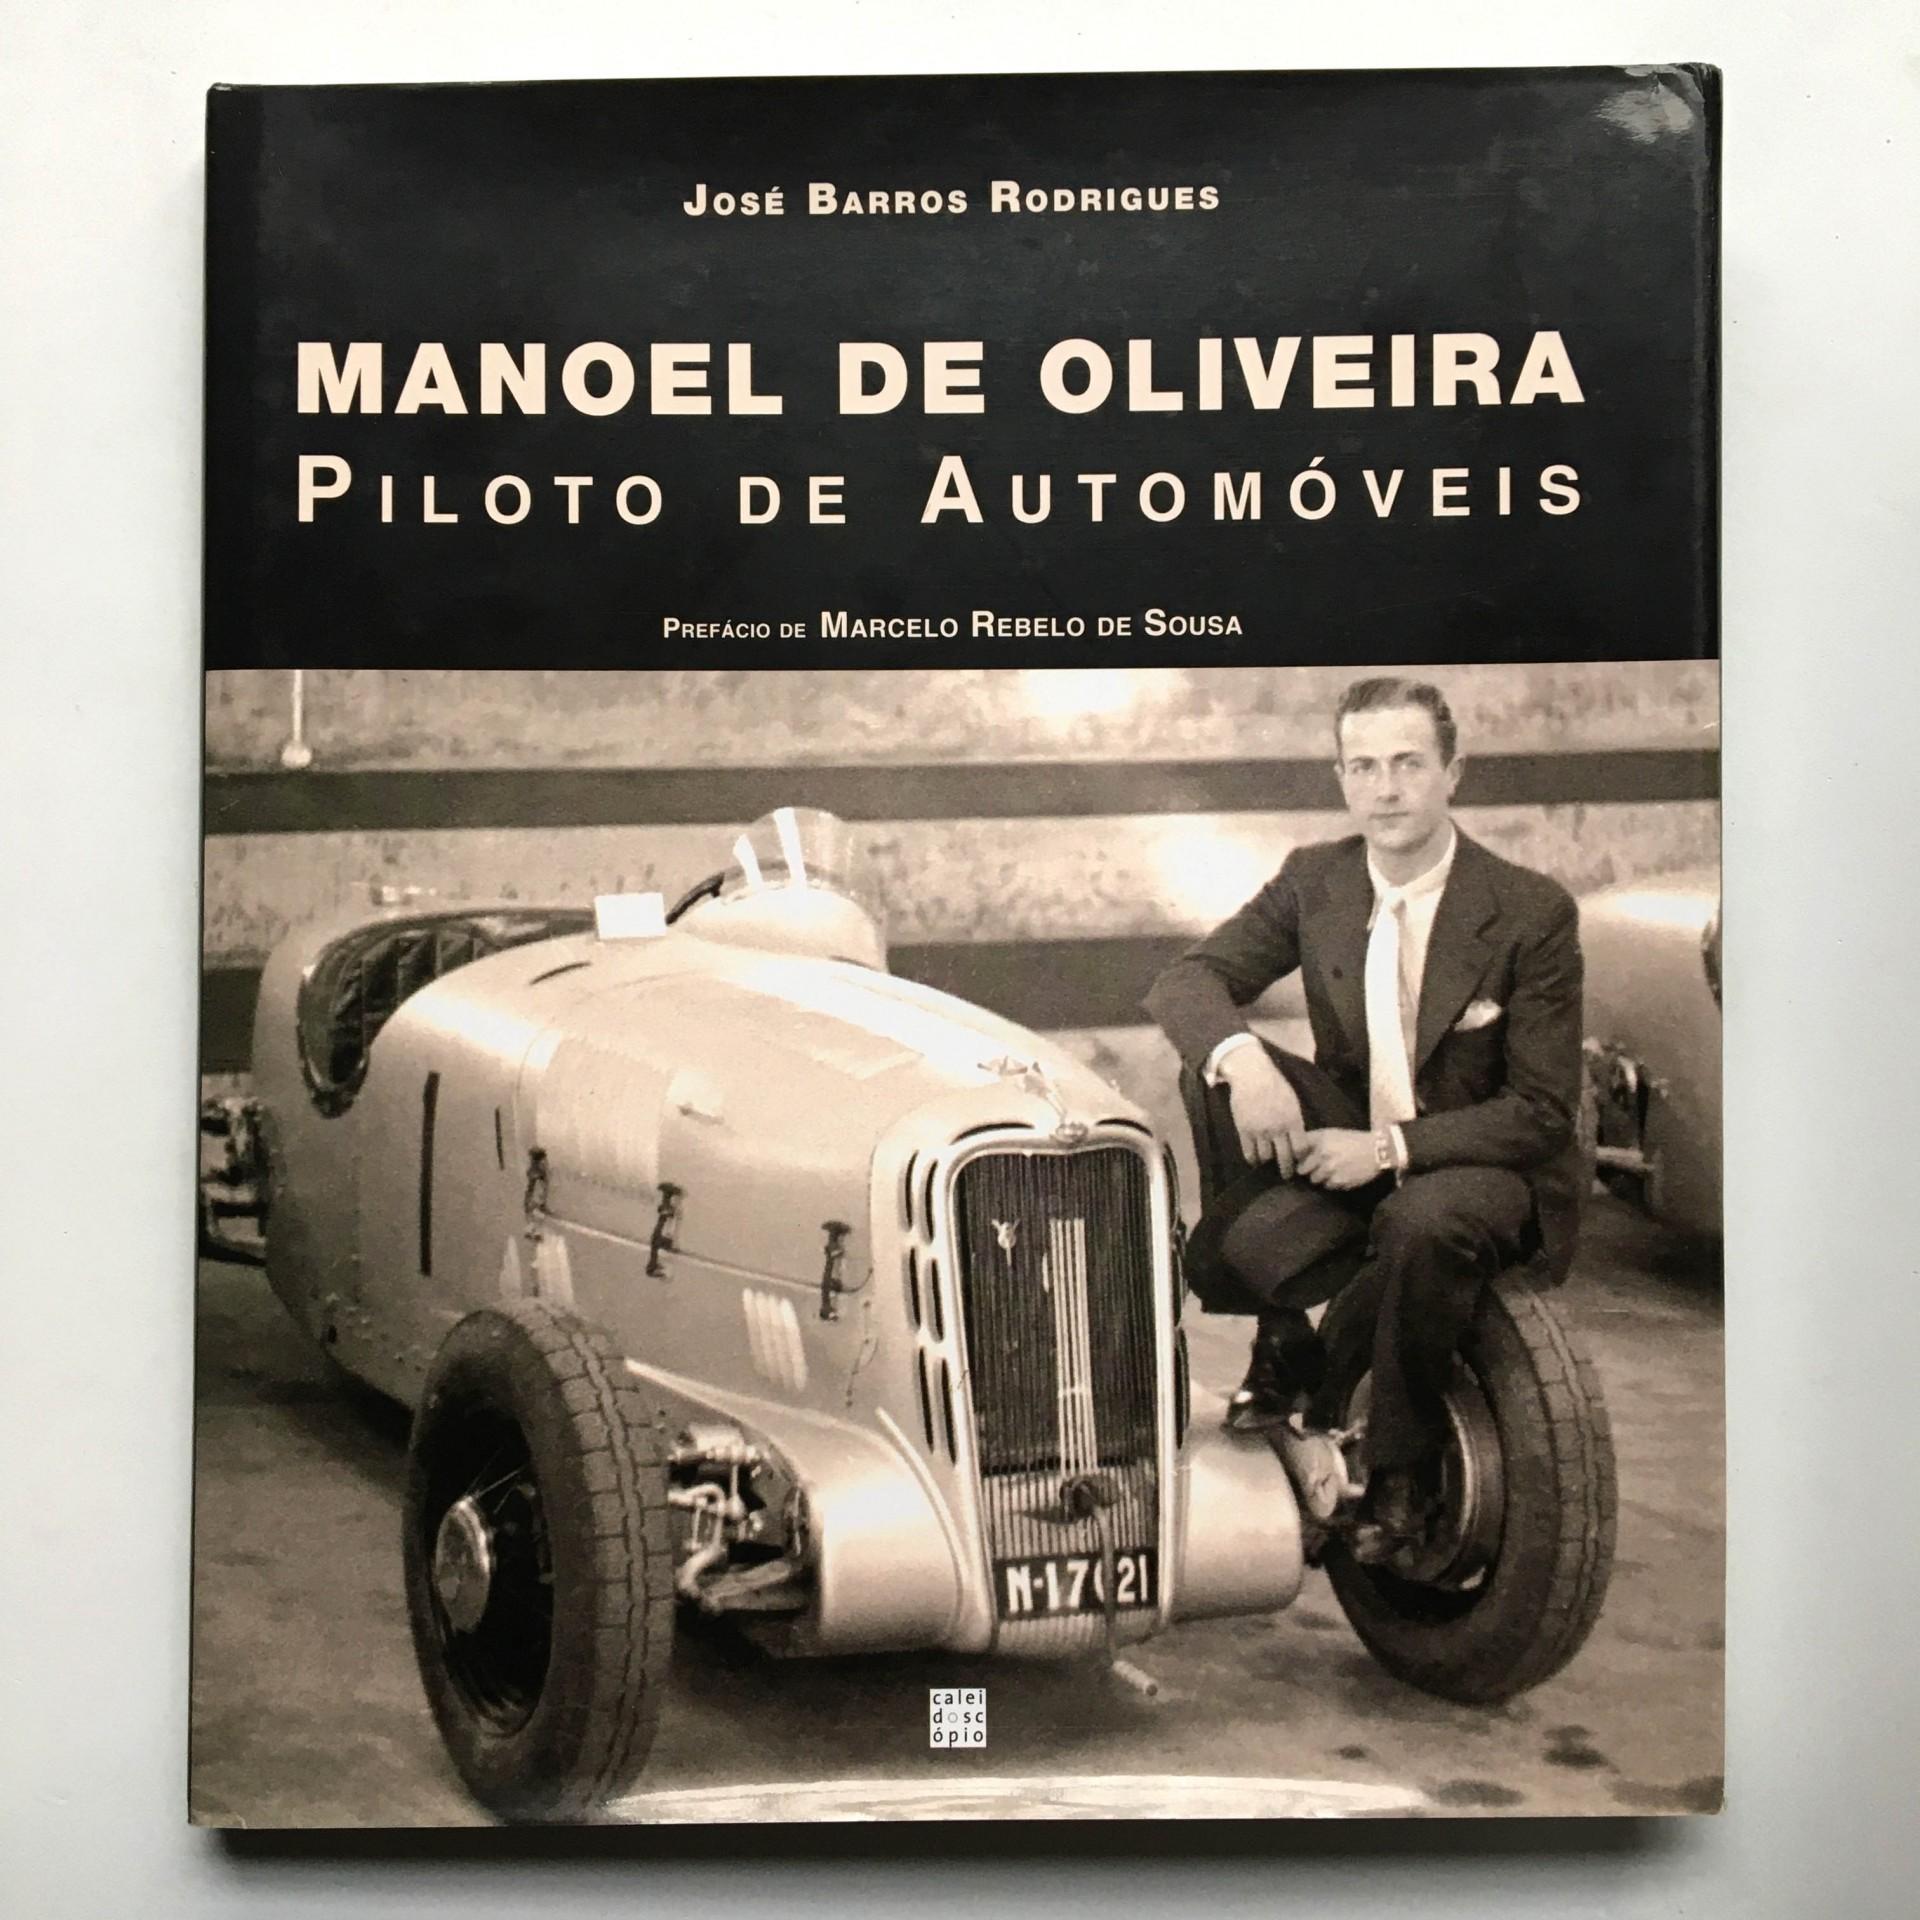 Manoel de Oliveira: piloto de automóveis